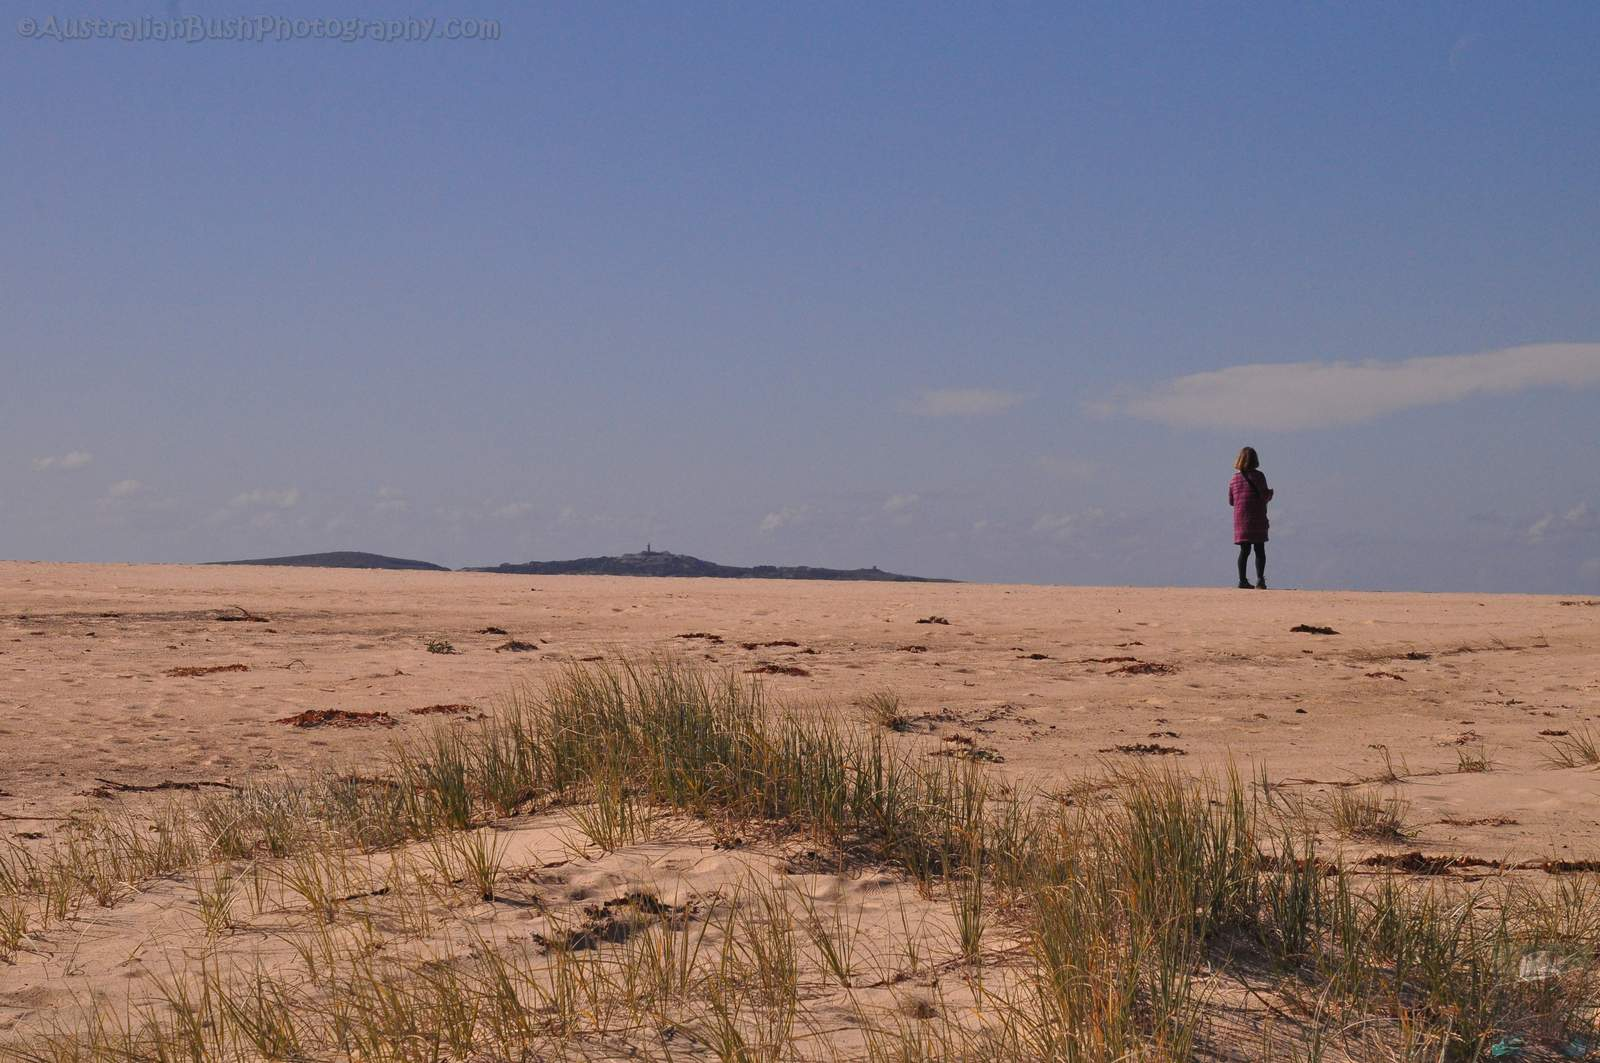 Billy's Beach and Corunna